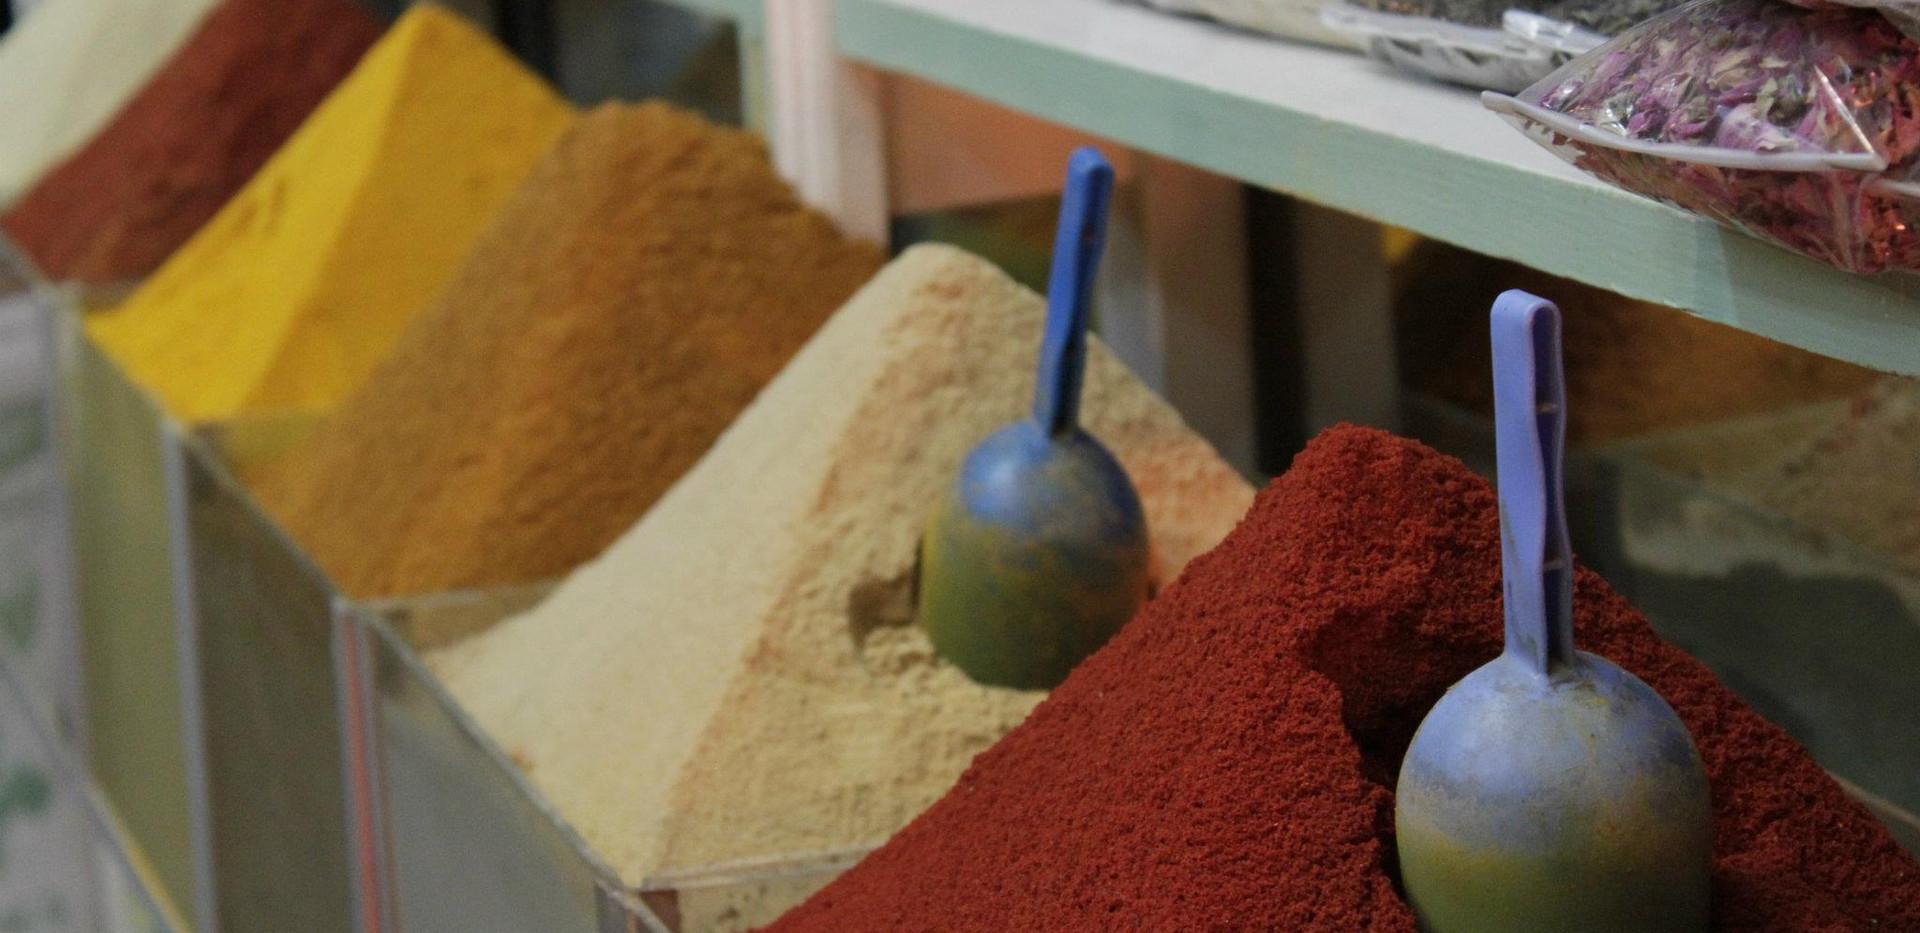 spices-in-marrakech_13873607484_o.jpg